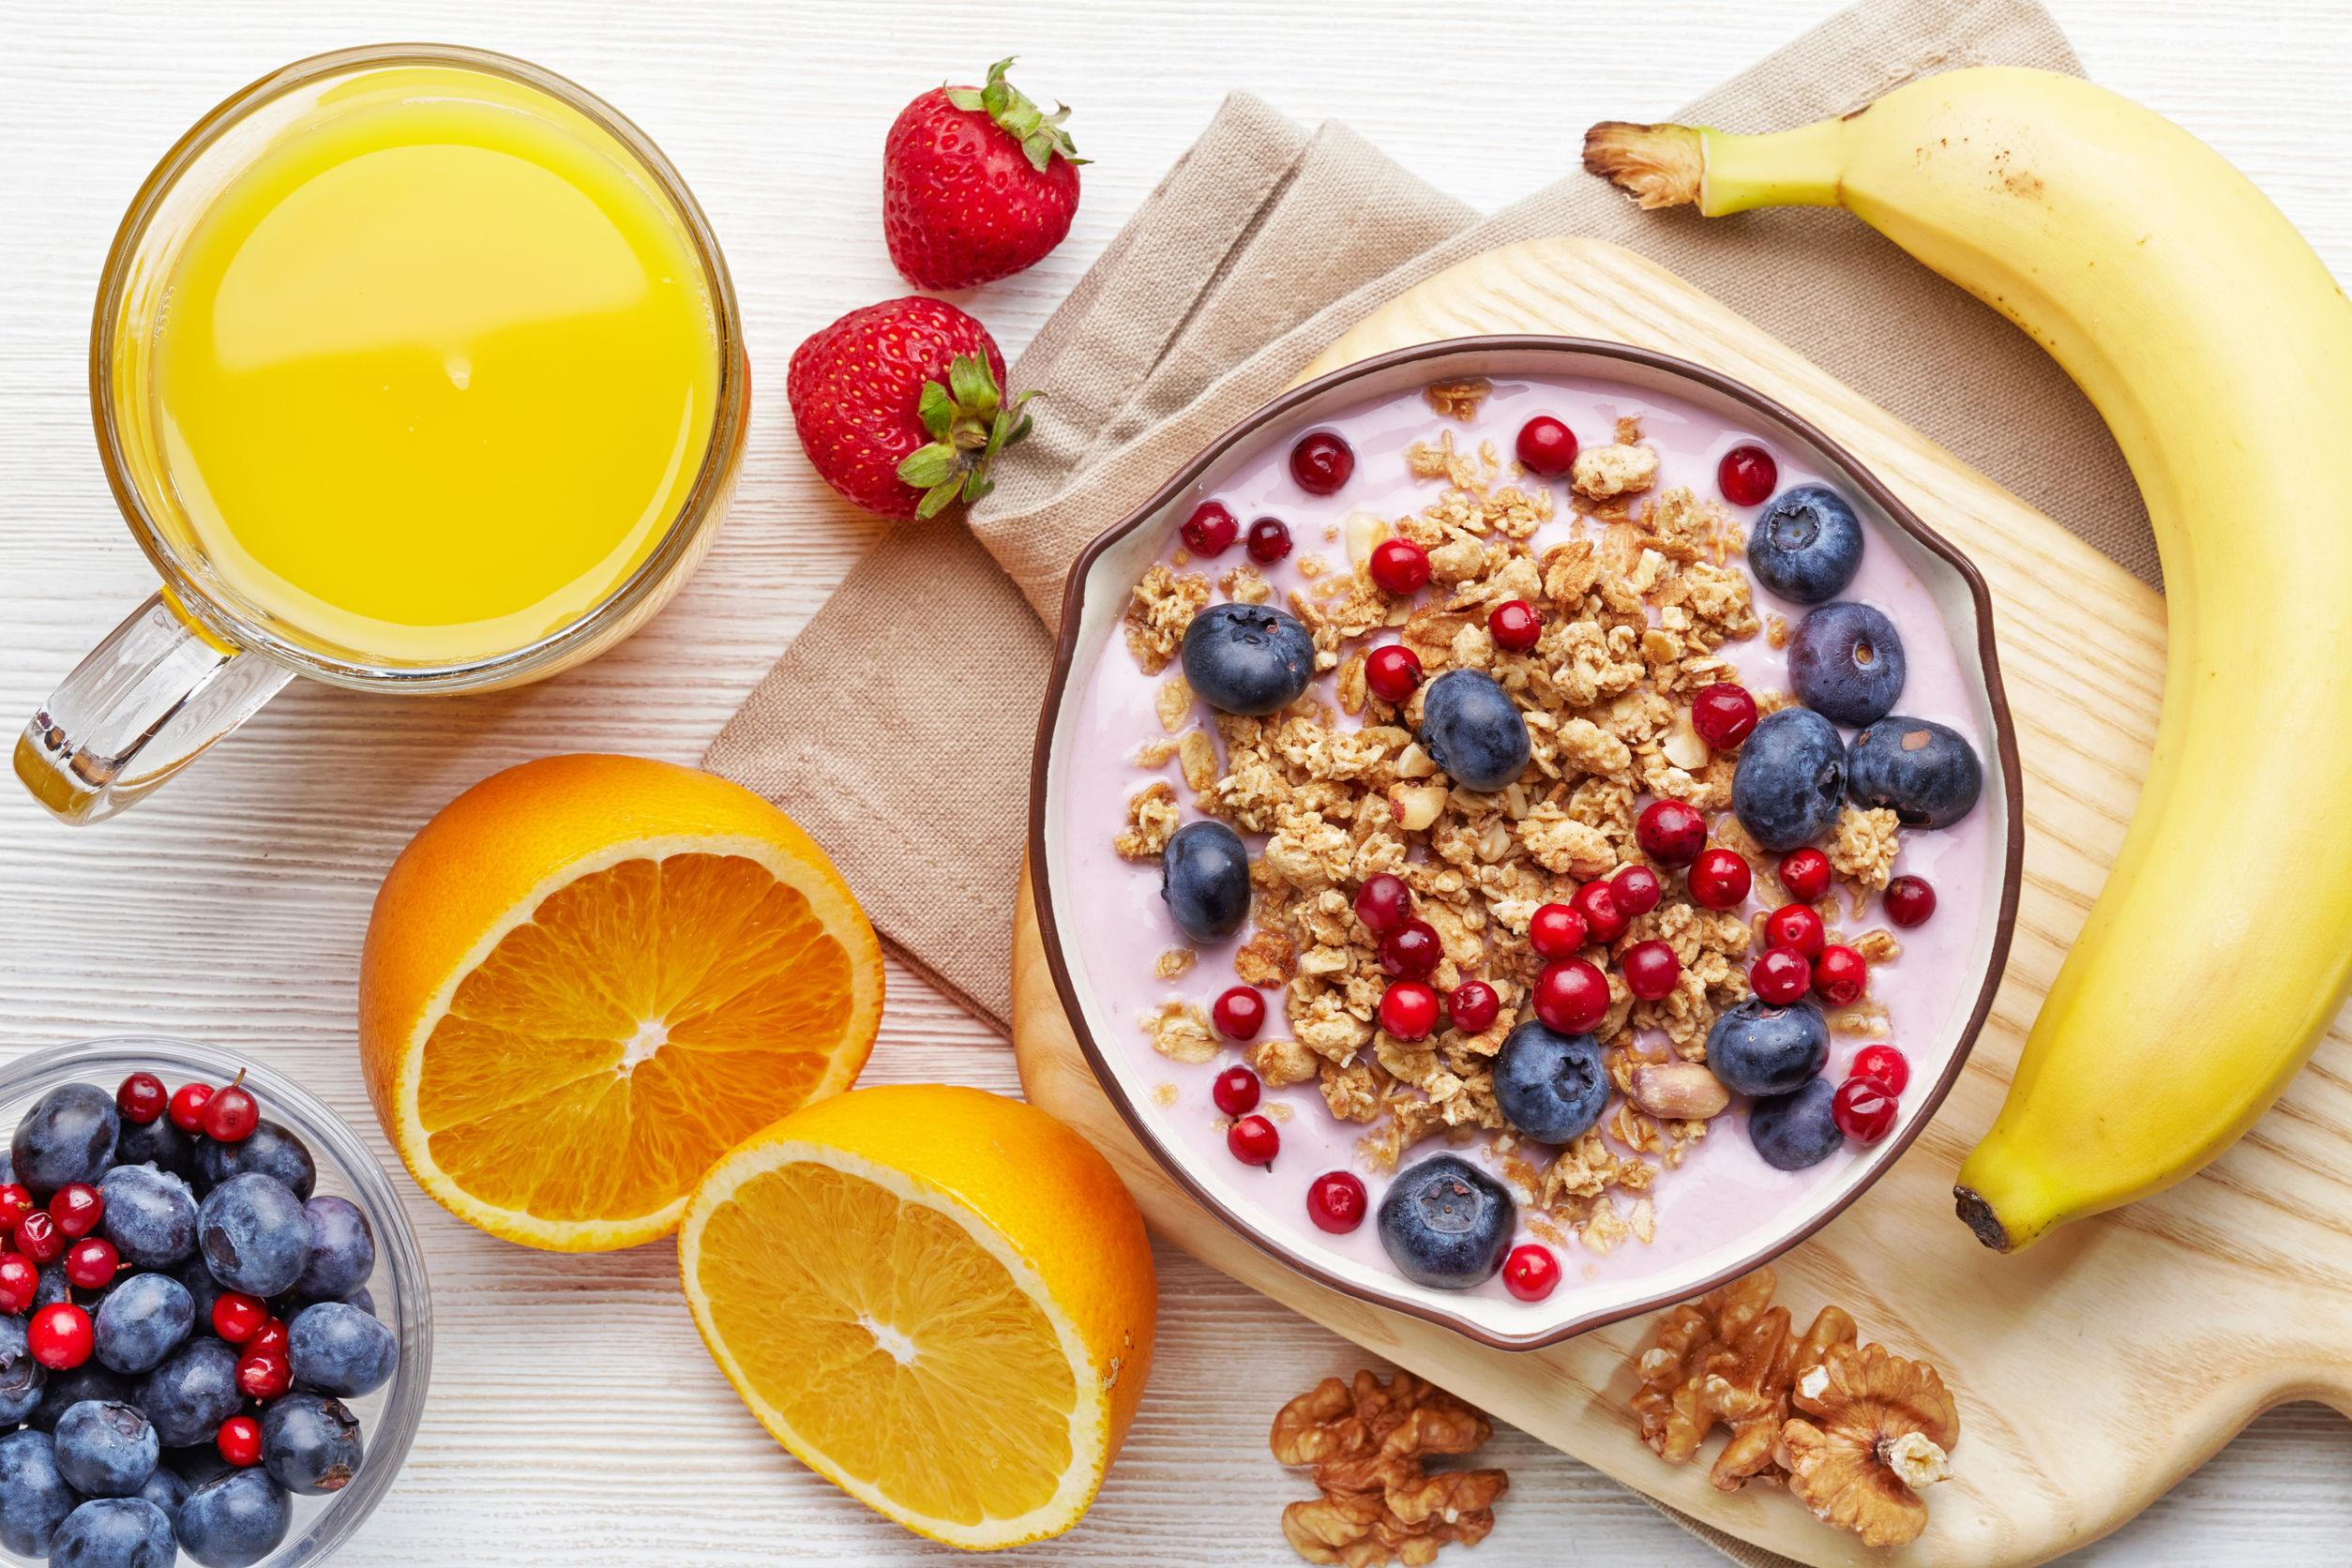 31587440 - healthy breakfast. bowl of yogurt with granola and berries